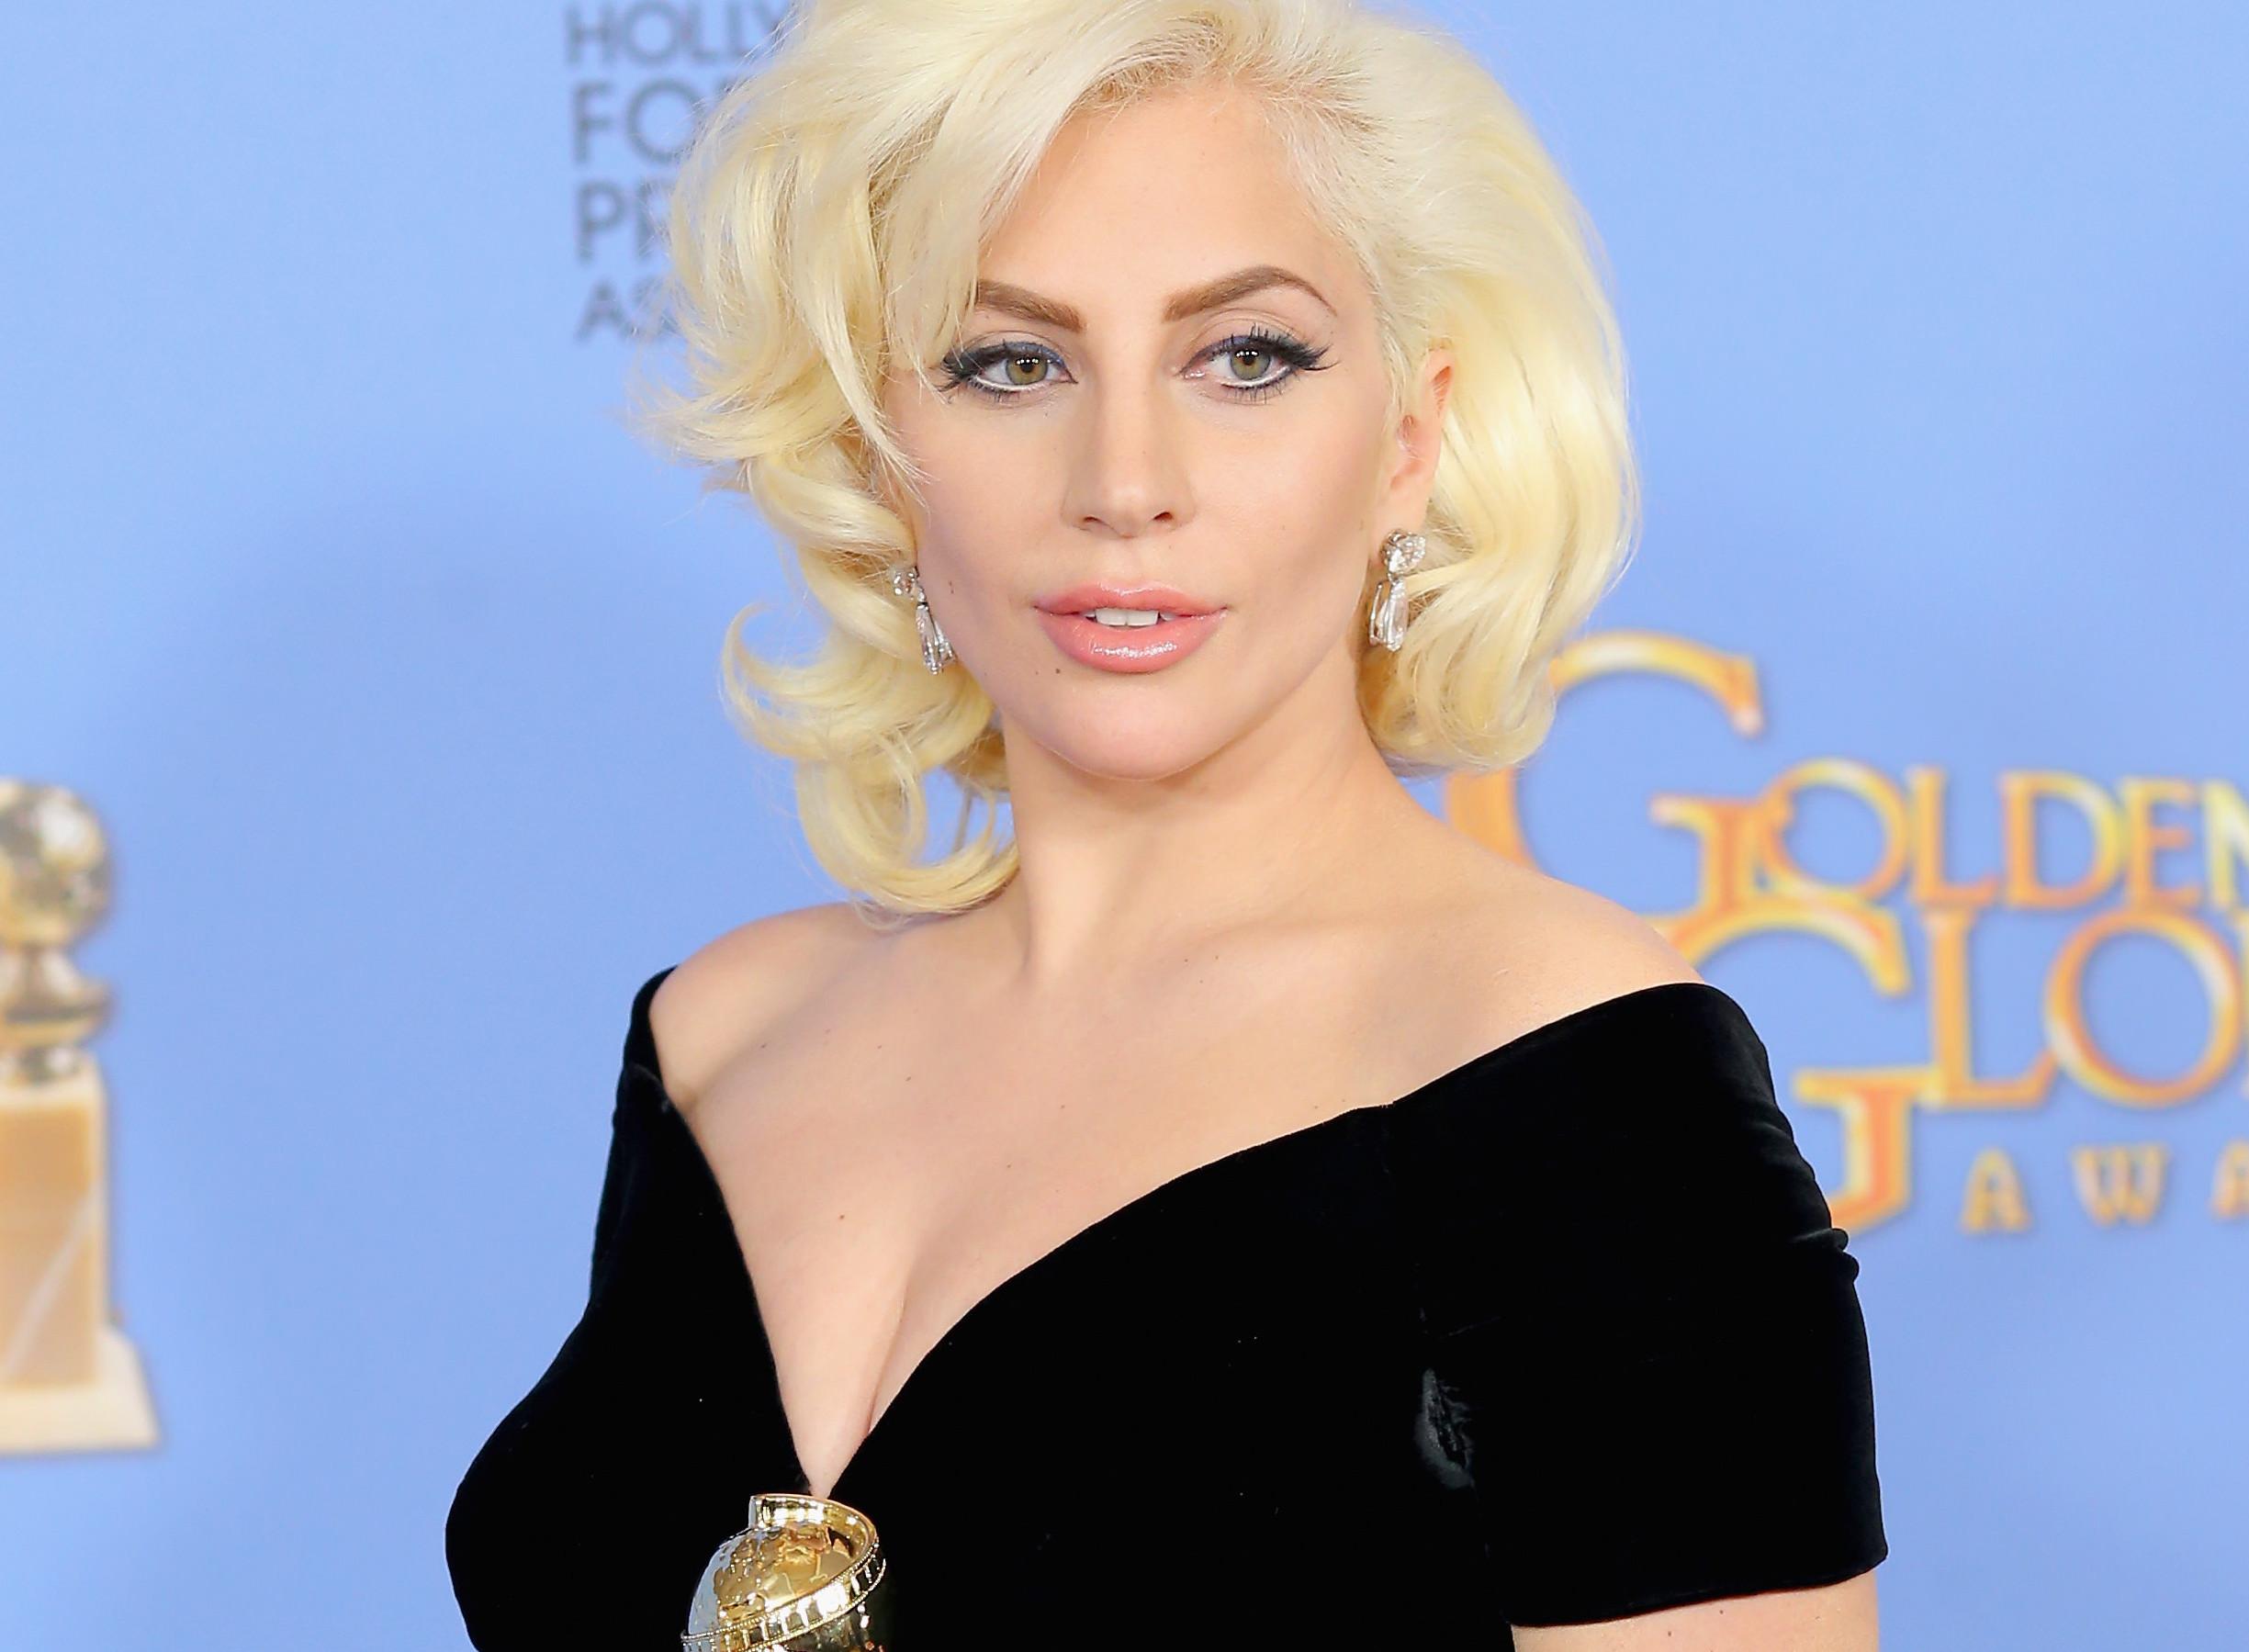 Lady Gaga aux Golden Globes